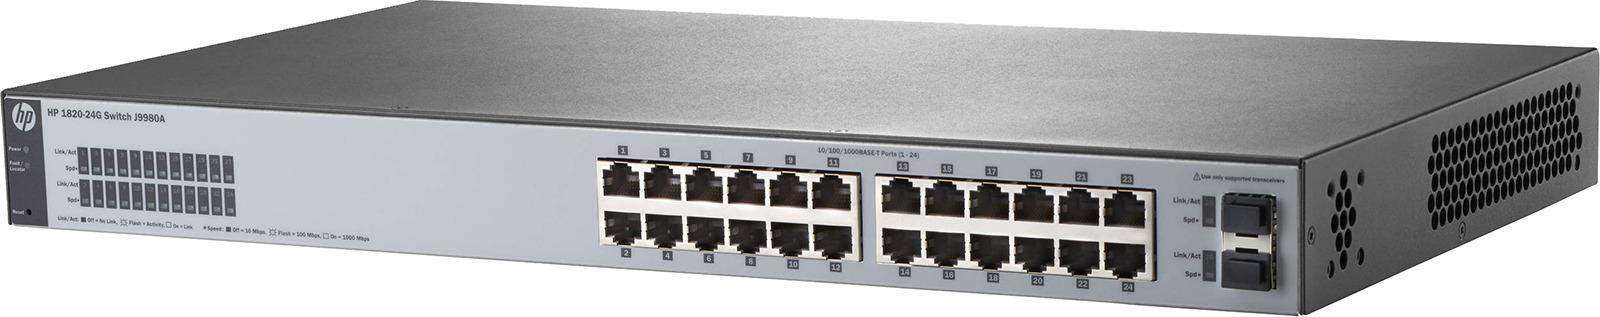 Коммутатор HPE 1820-24G, управляемый, J9980A коммутатор hpe 1820 24g poe управляемый j9983a